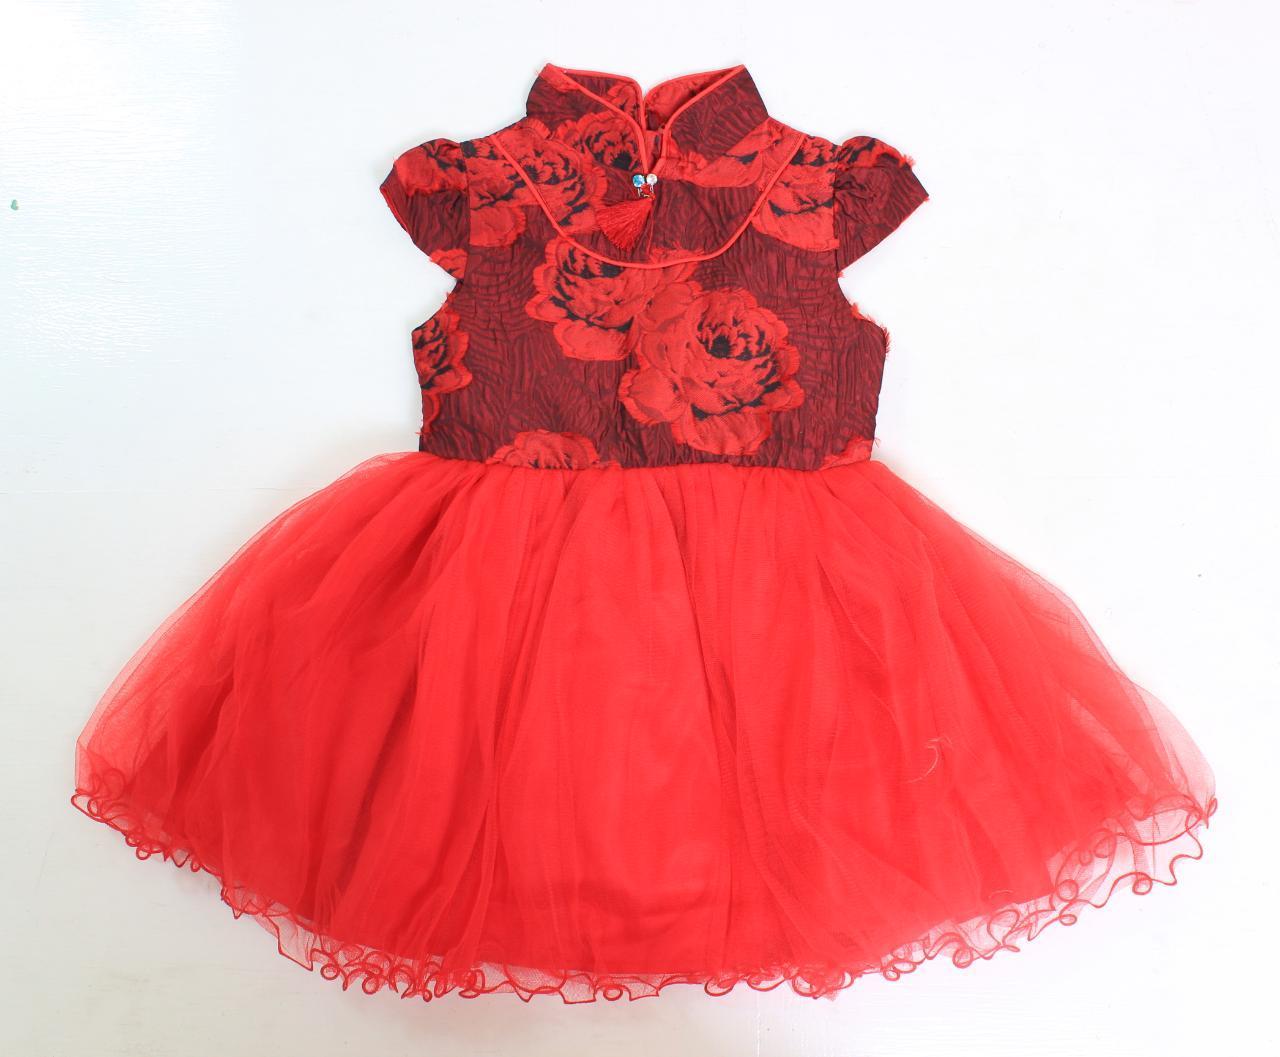 PLAYFUL TOTS Dress Ciongsam Anak Tutu Bunga Merah